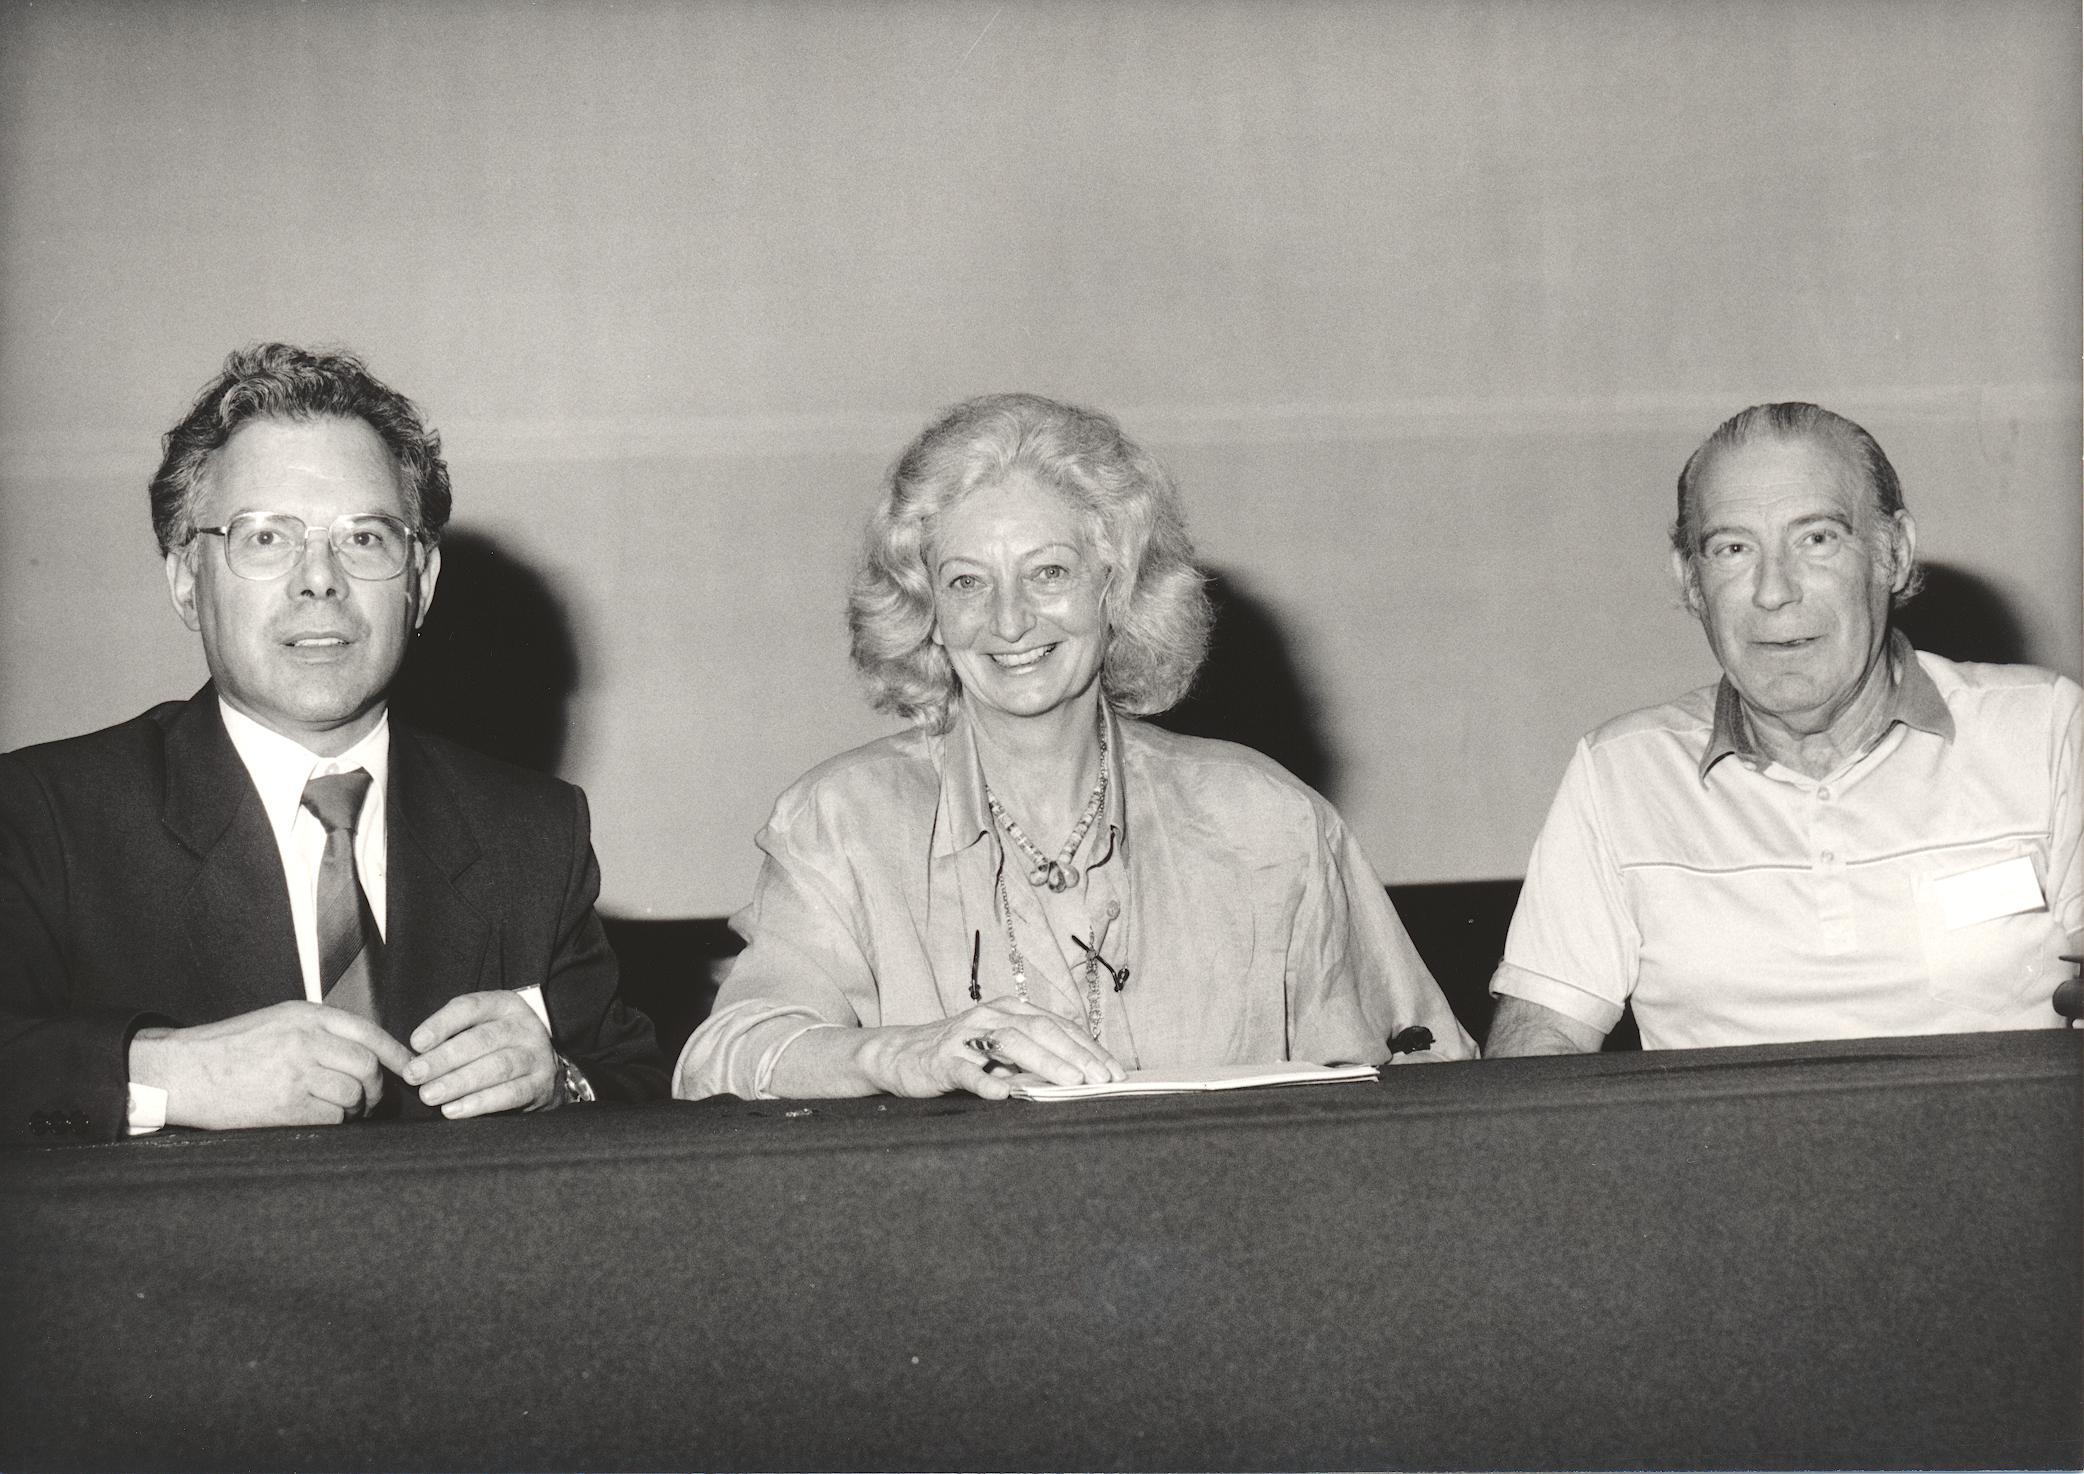 XI. Imago Mundi-Kongress 1987, Innsbruck,, von links Prof. Andreas Resch, Ilse Corte, Prof. Ernst Senkowski